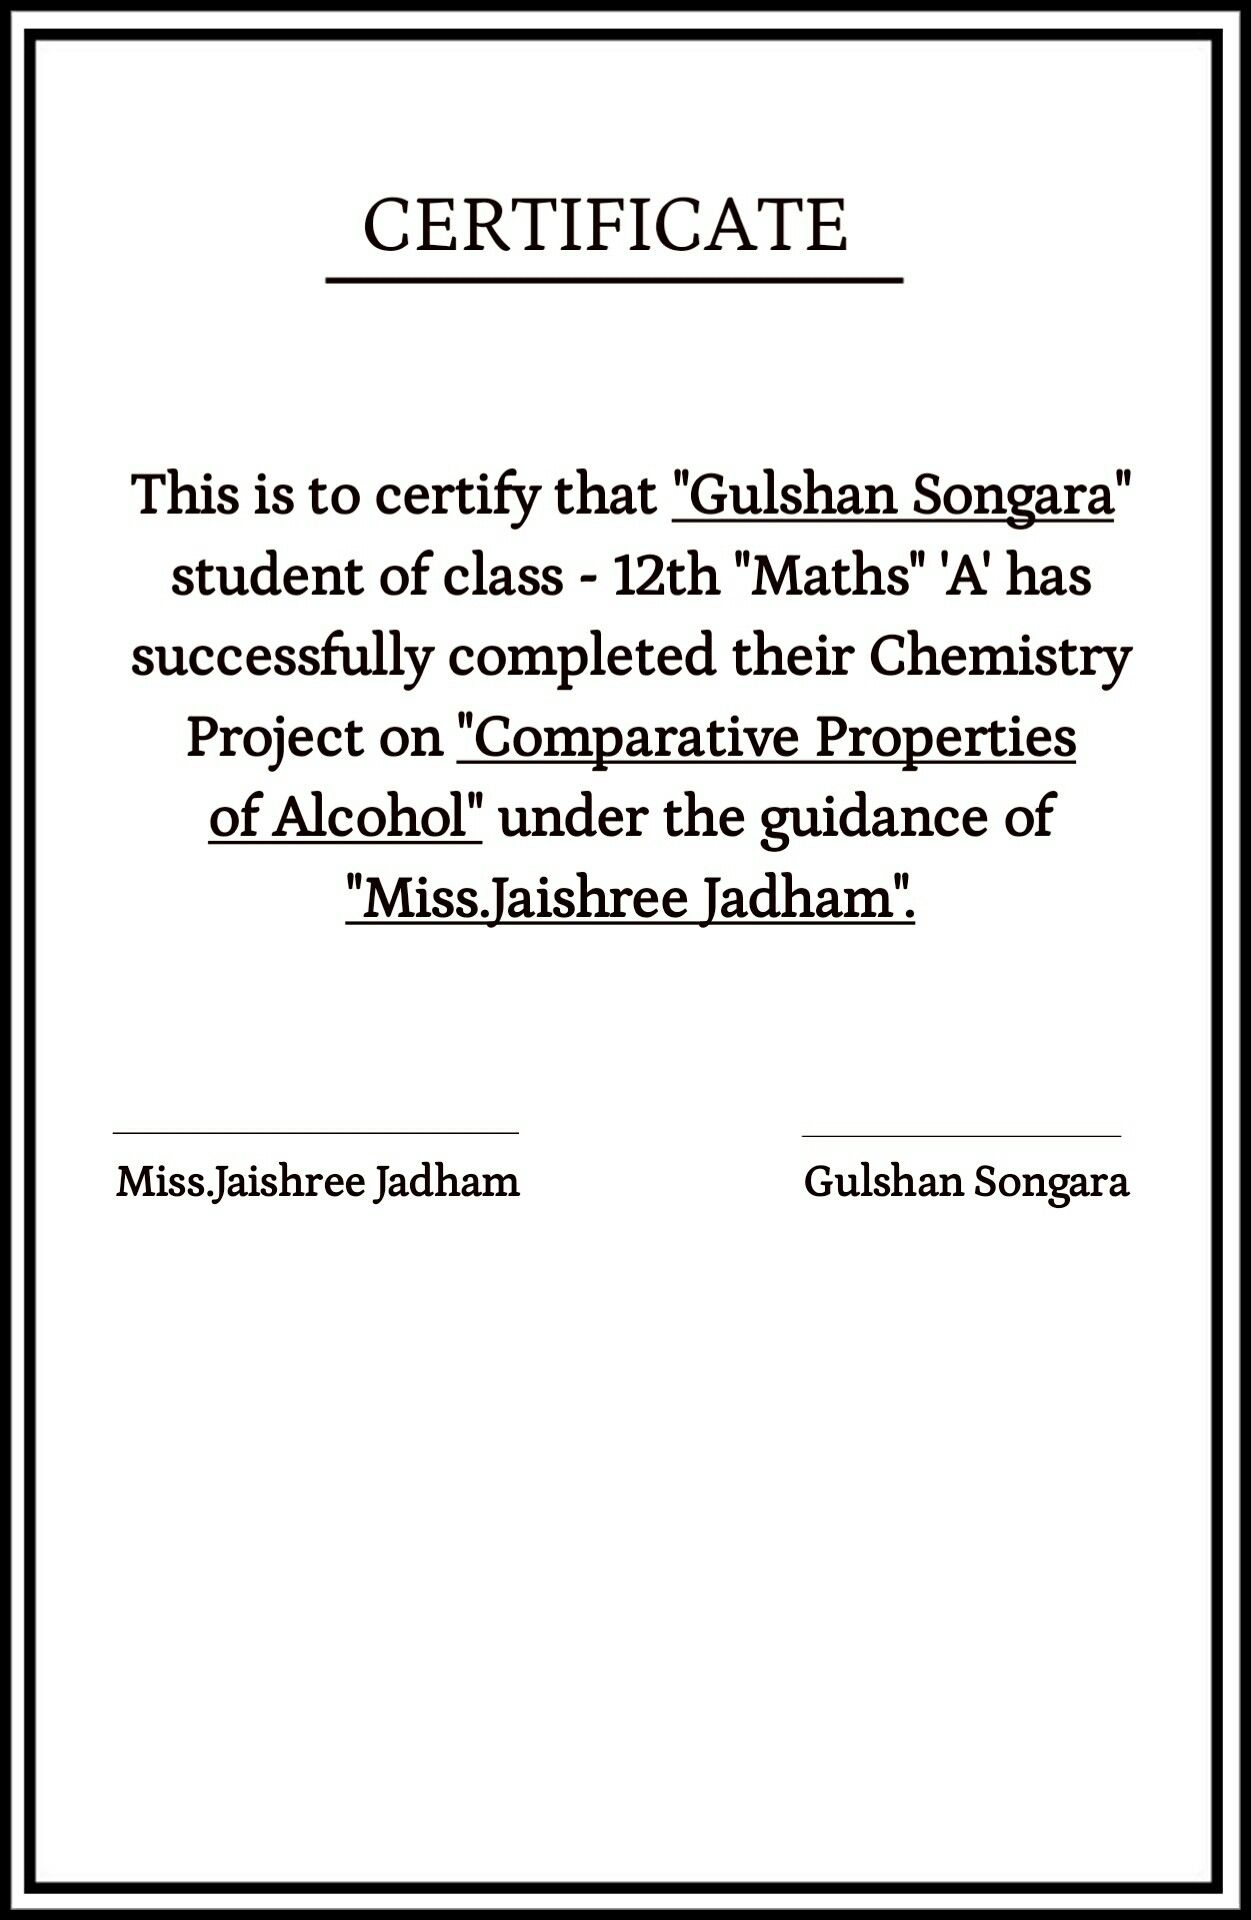 Certificate school projects sample school projects pinterest certificate school projects sample yadclub Choice Image